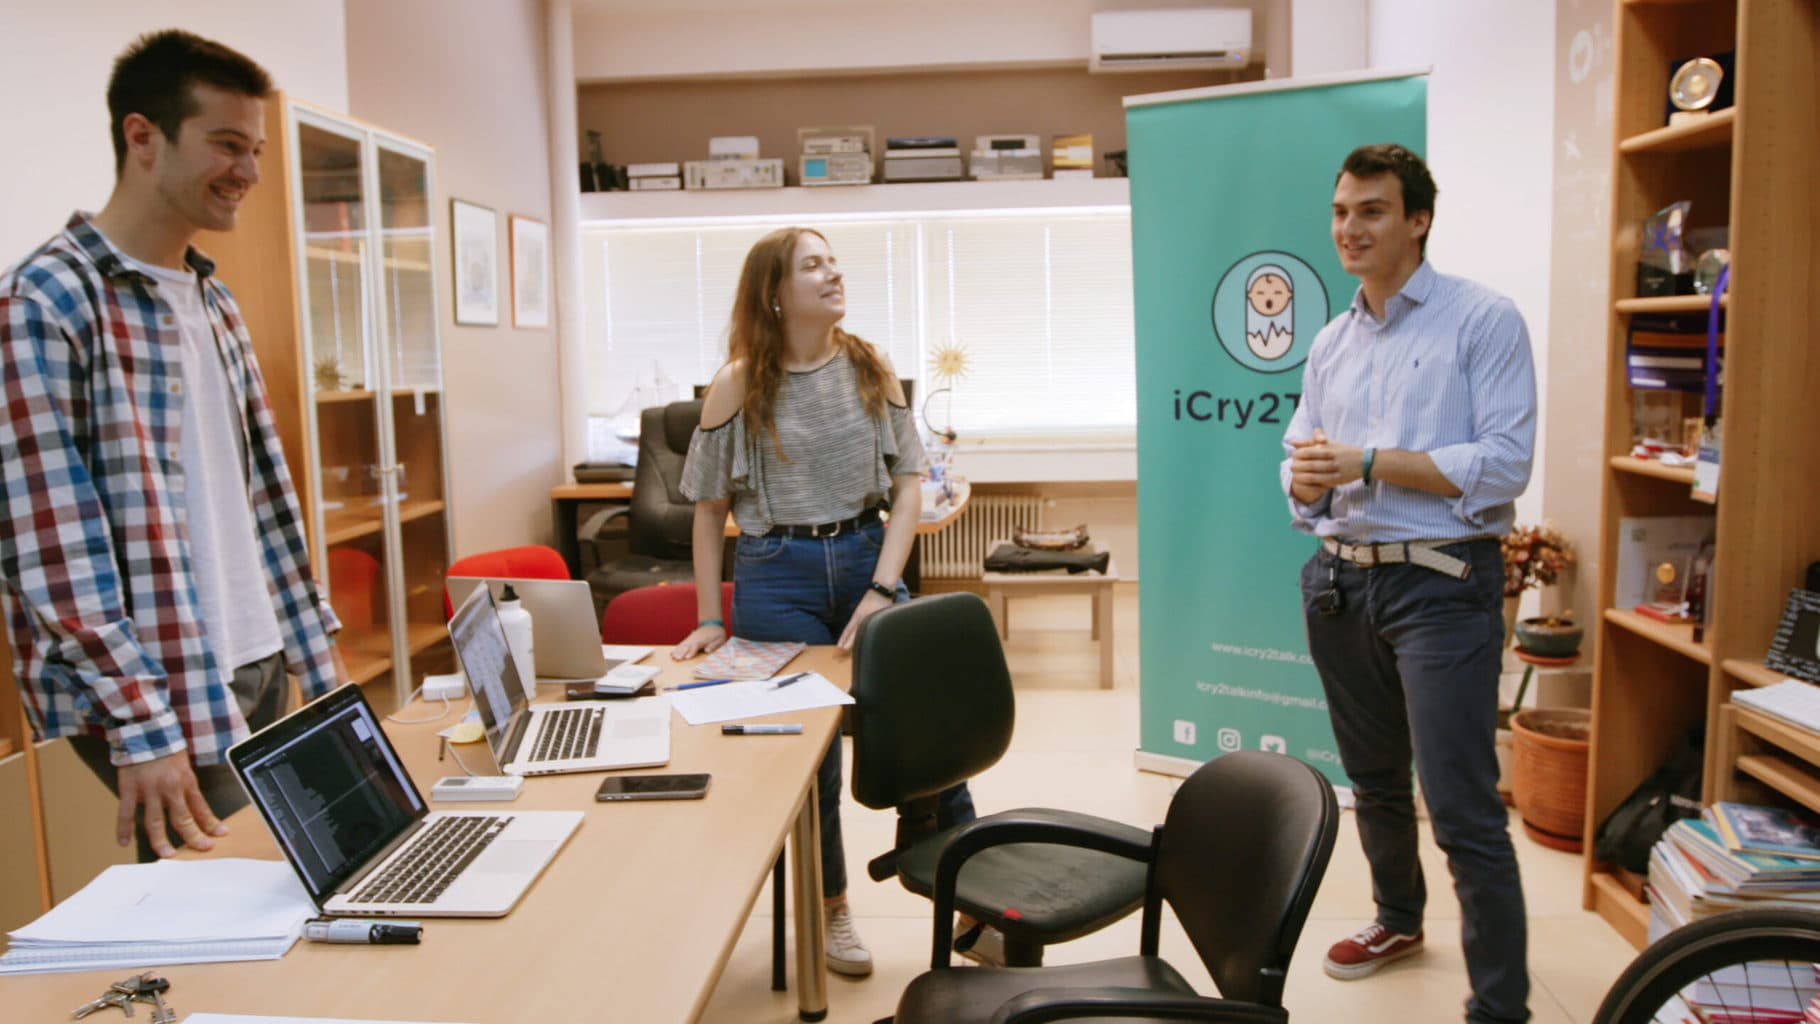 Jason Hadzikostas, co-founder of ICry2Talk. Photo: Future of Work Film Inc.